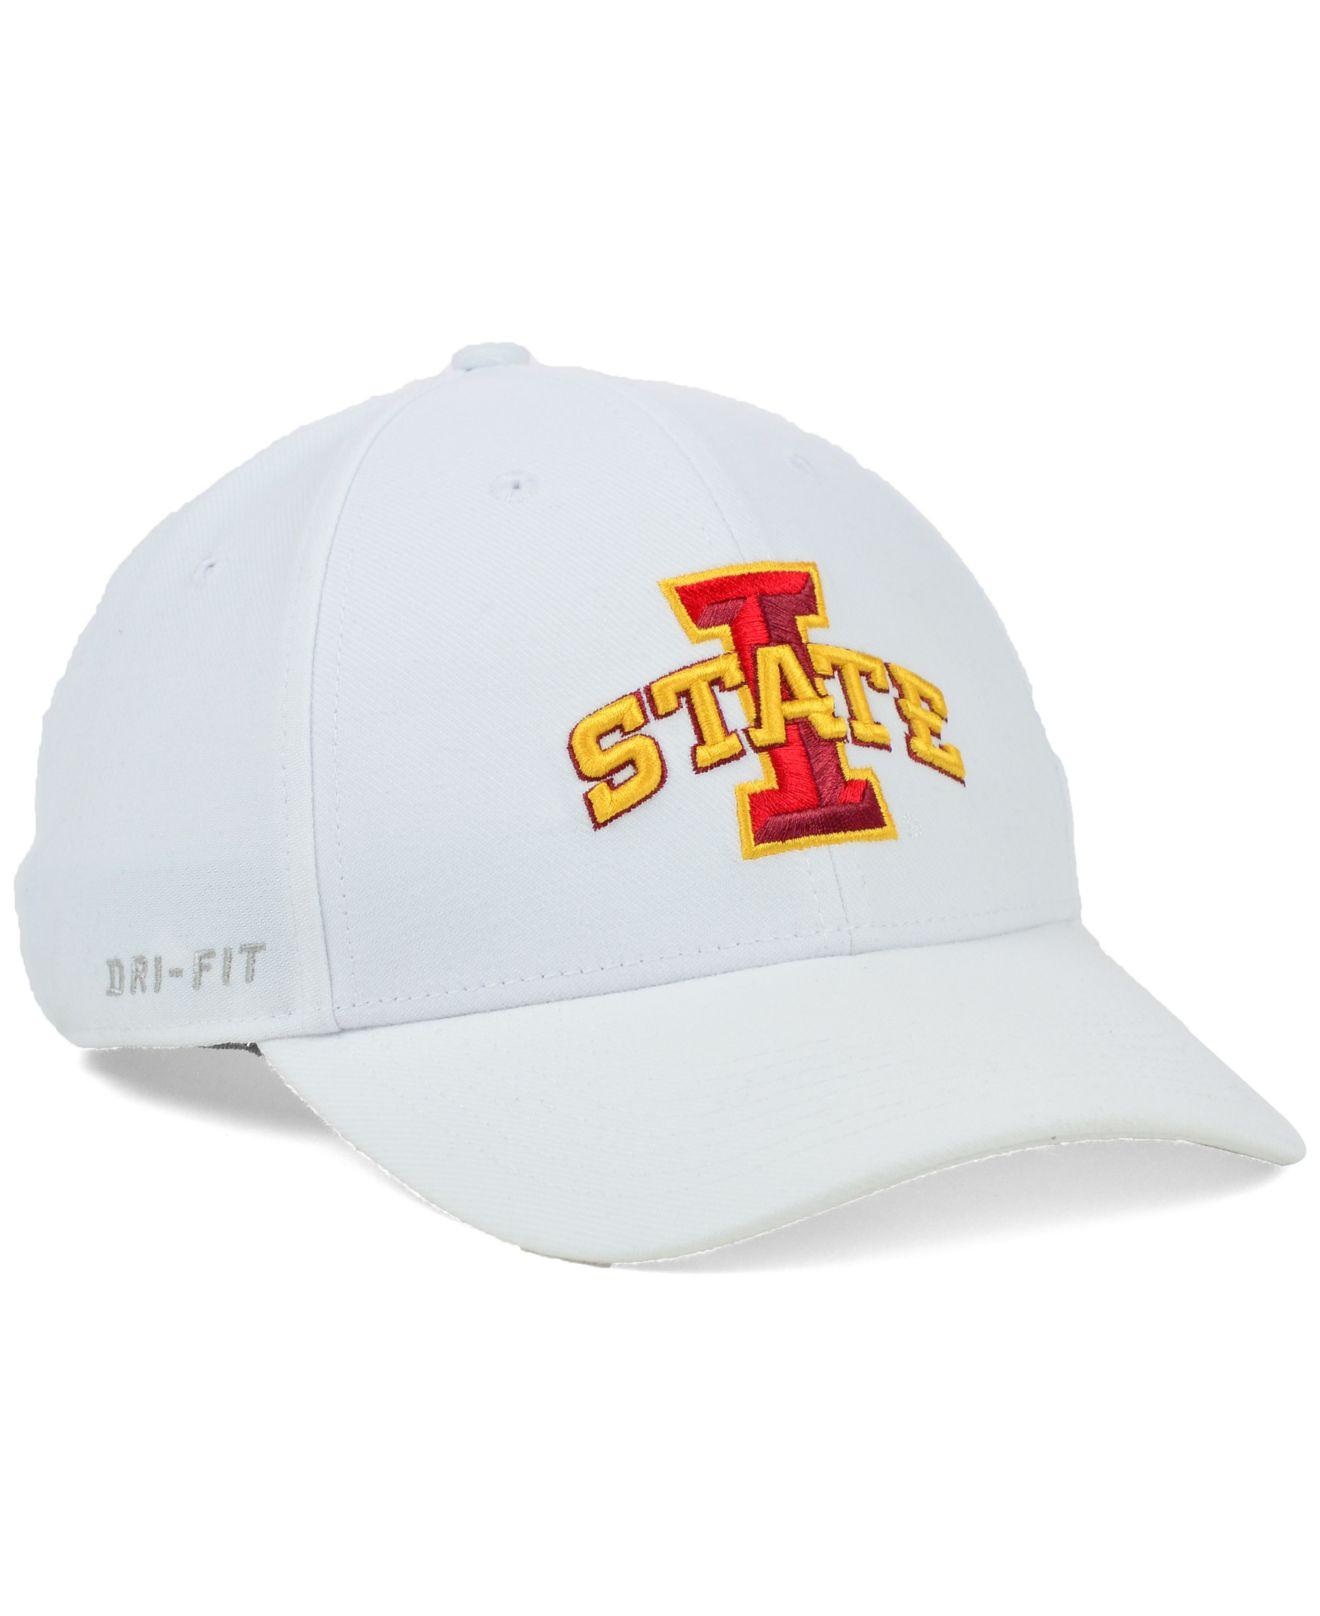 online store 99621 e0ca9 ... ireland lyst nike iowa state cyclones dri fit swooshflex cap in white  for men b16cf ae9c9